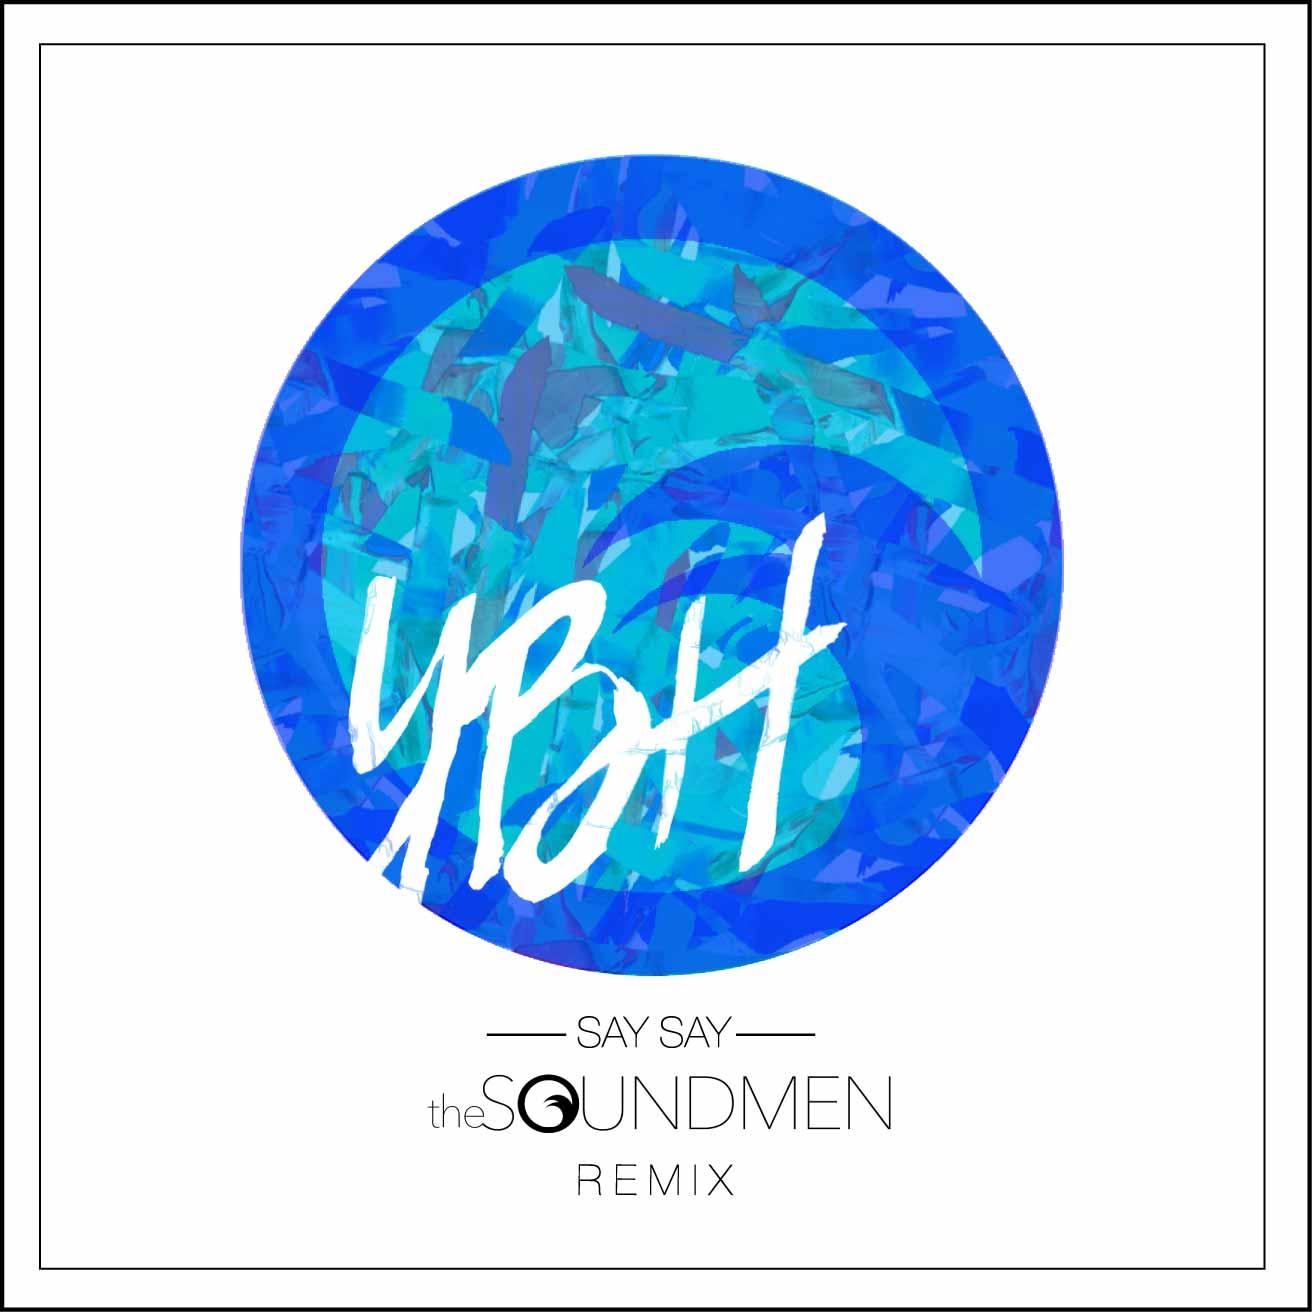 YBH-remix-art-1-2.jpg